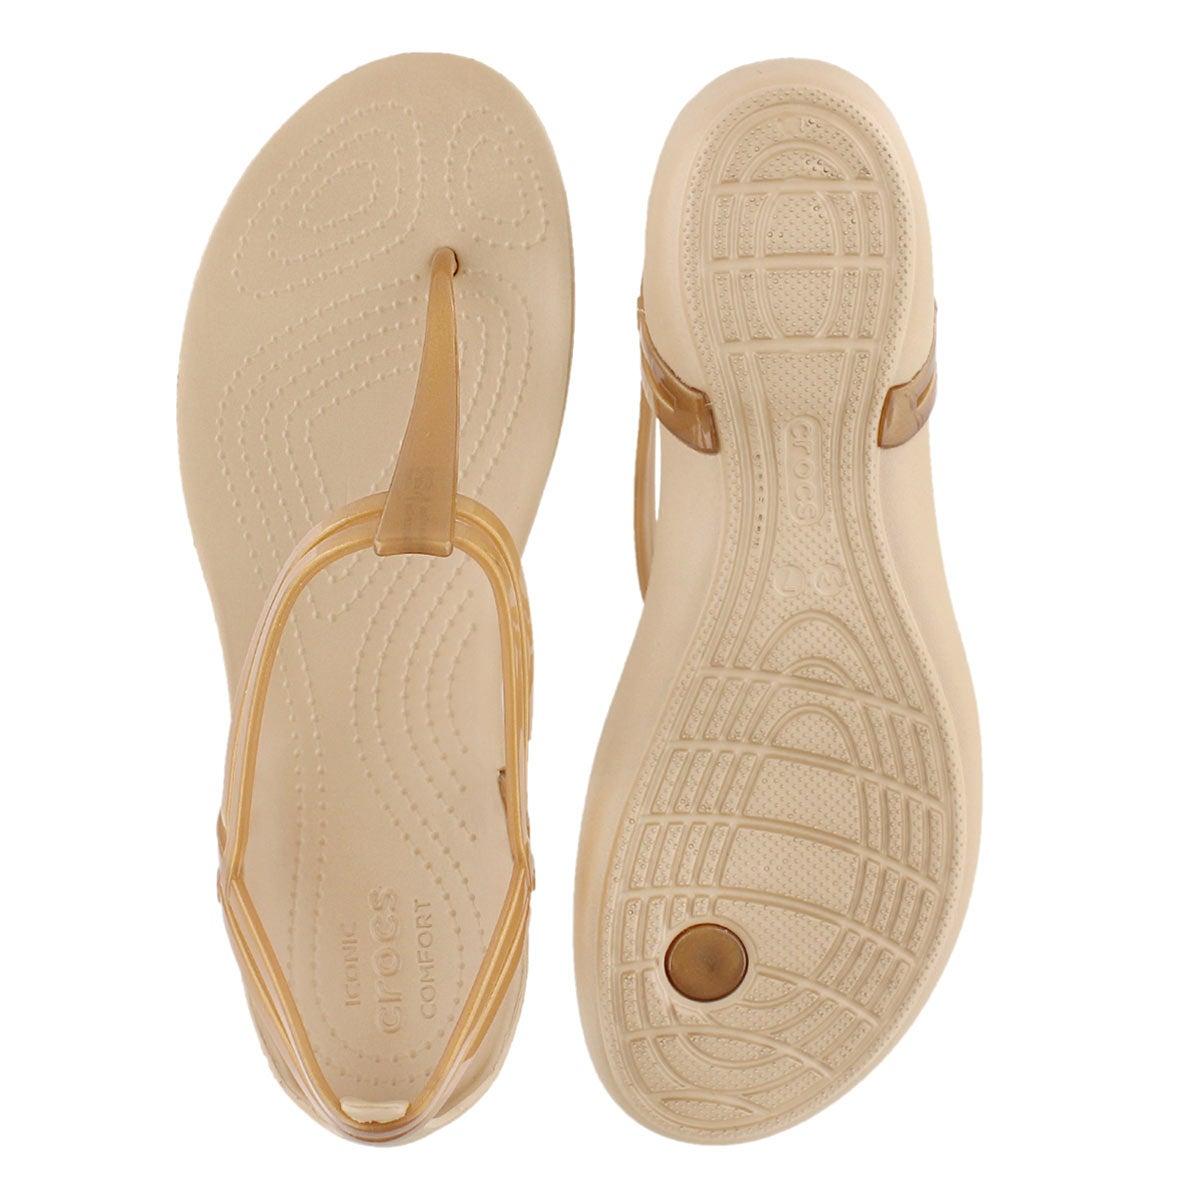 Sandale tong Isabella T-Strap, brze, fem